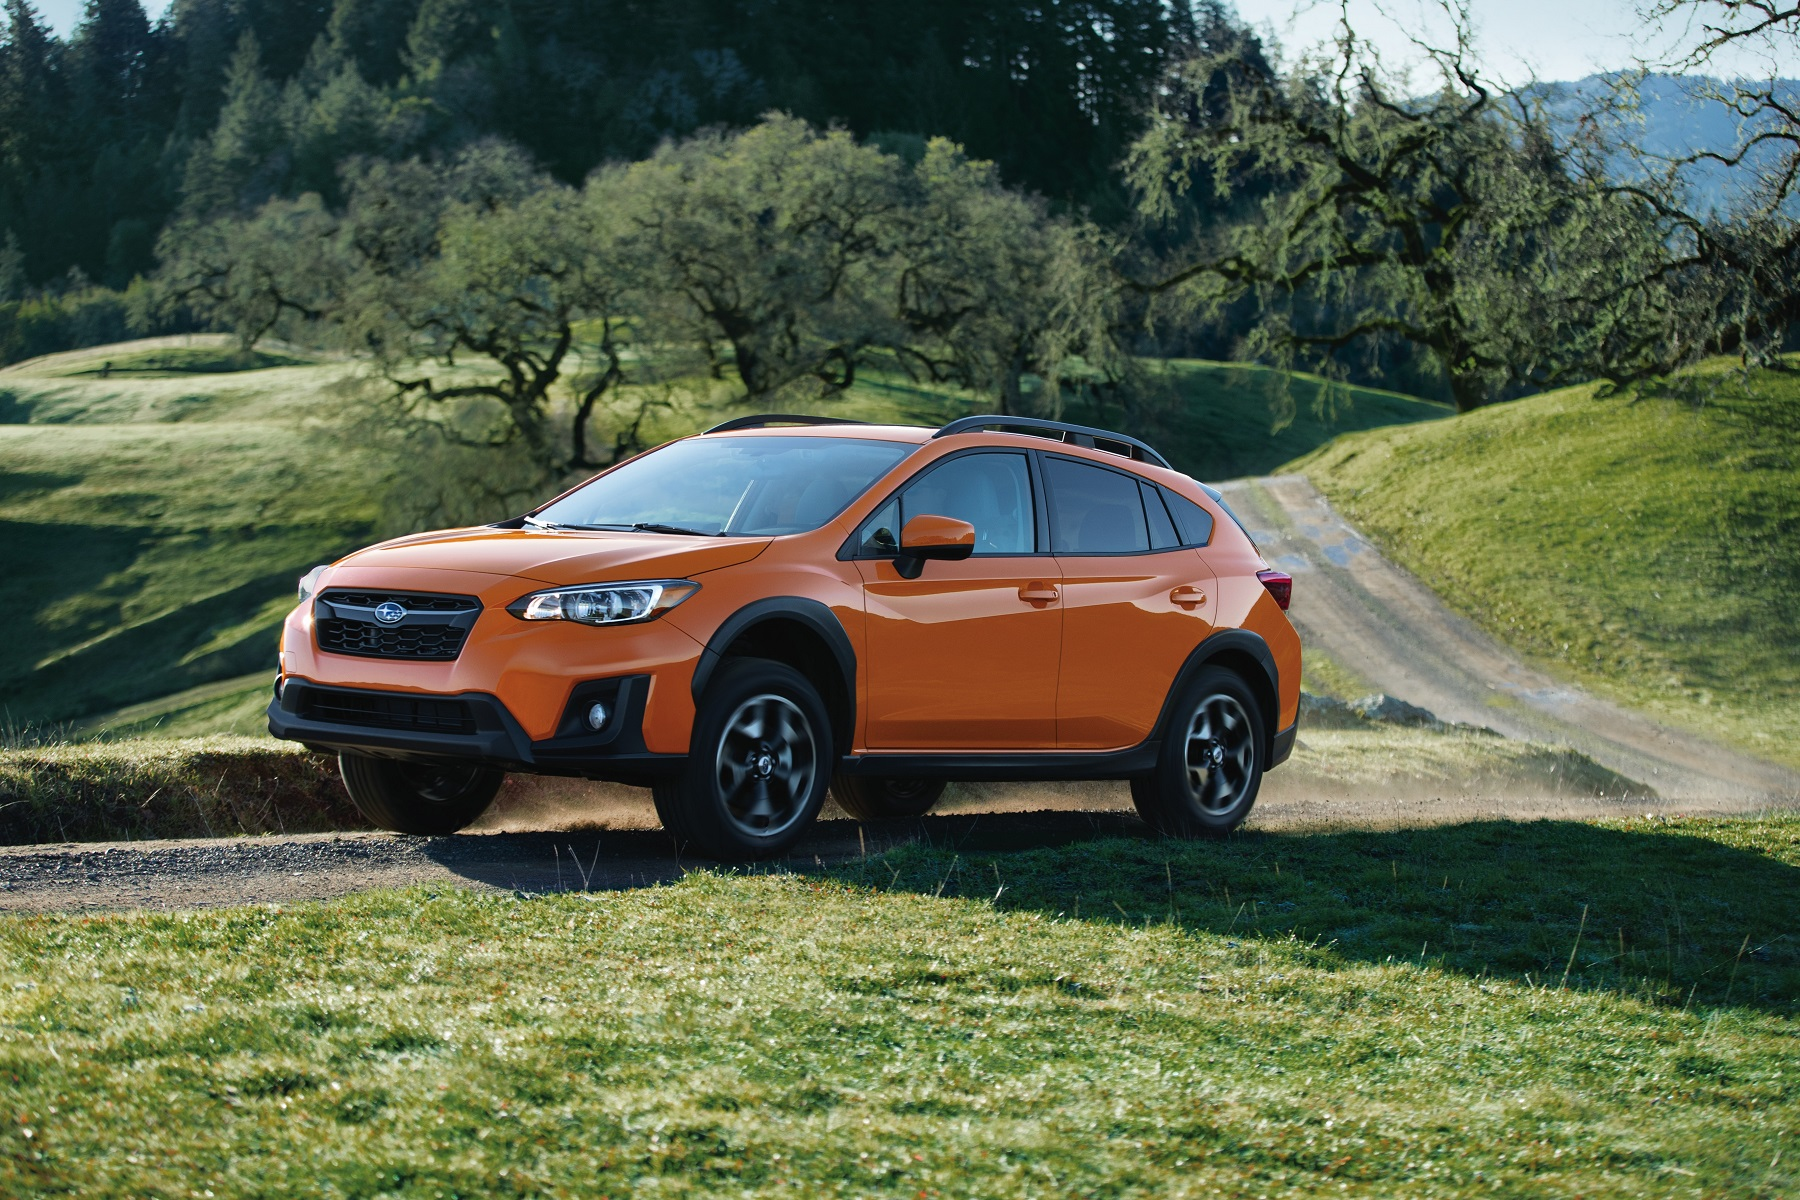 Pursuing f Road Wonders in 2018 Subaru Crosstrek Get f the